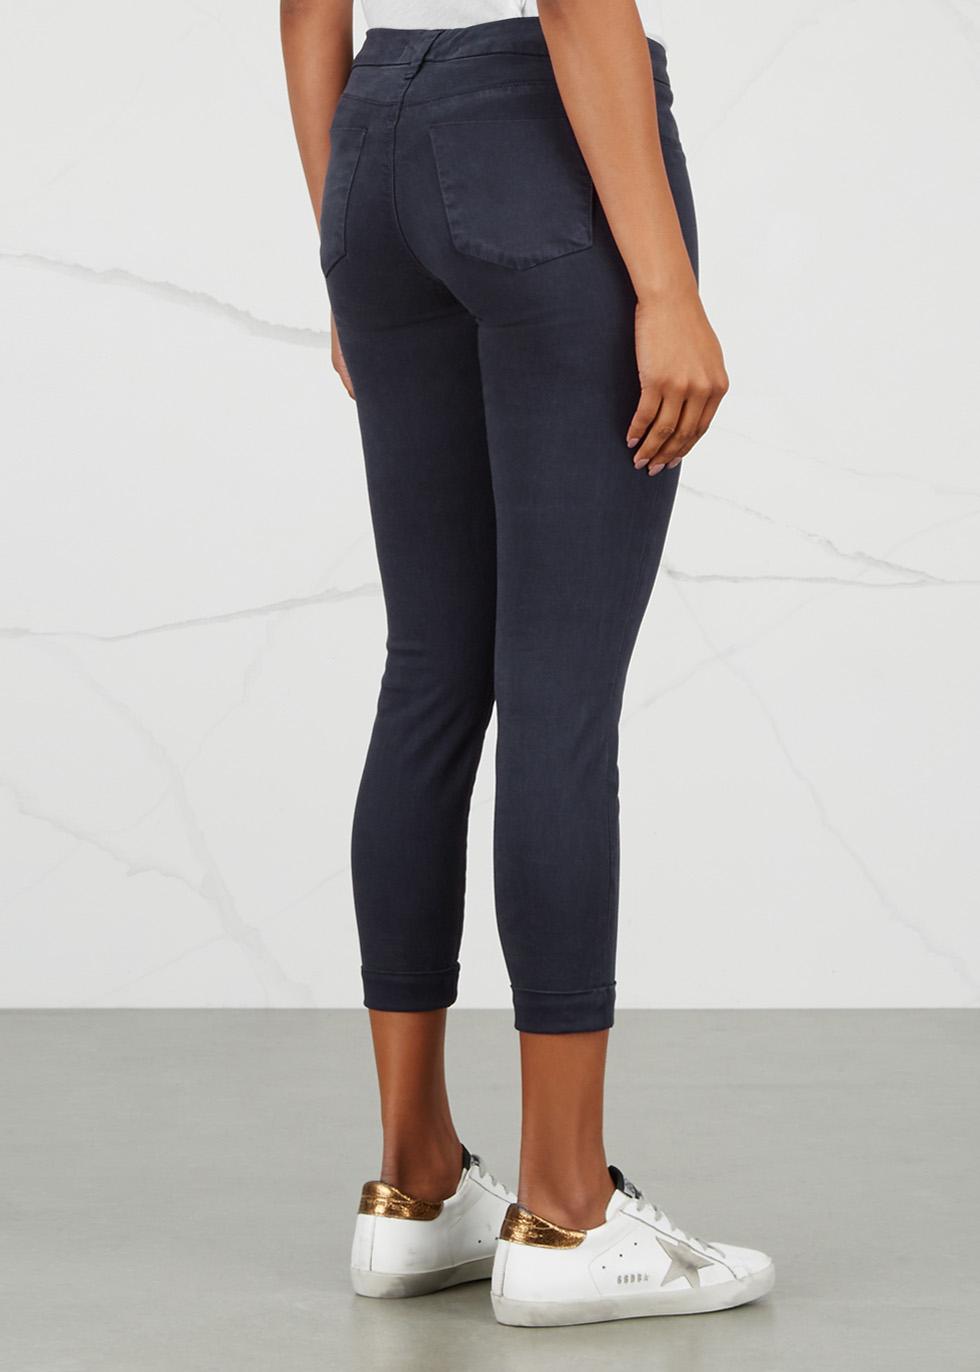 Anja navy cropped skinny jeans - J Brand